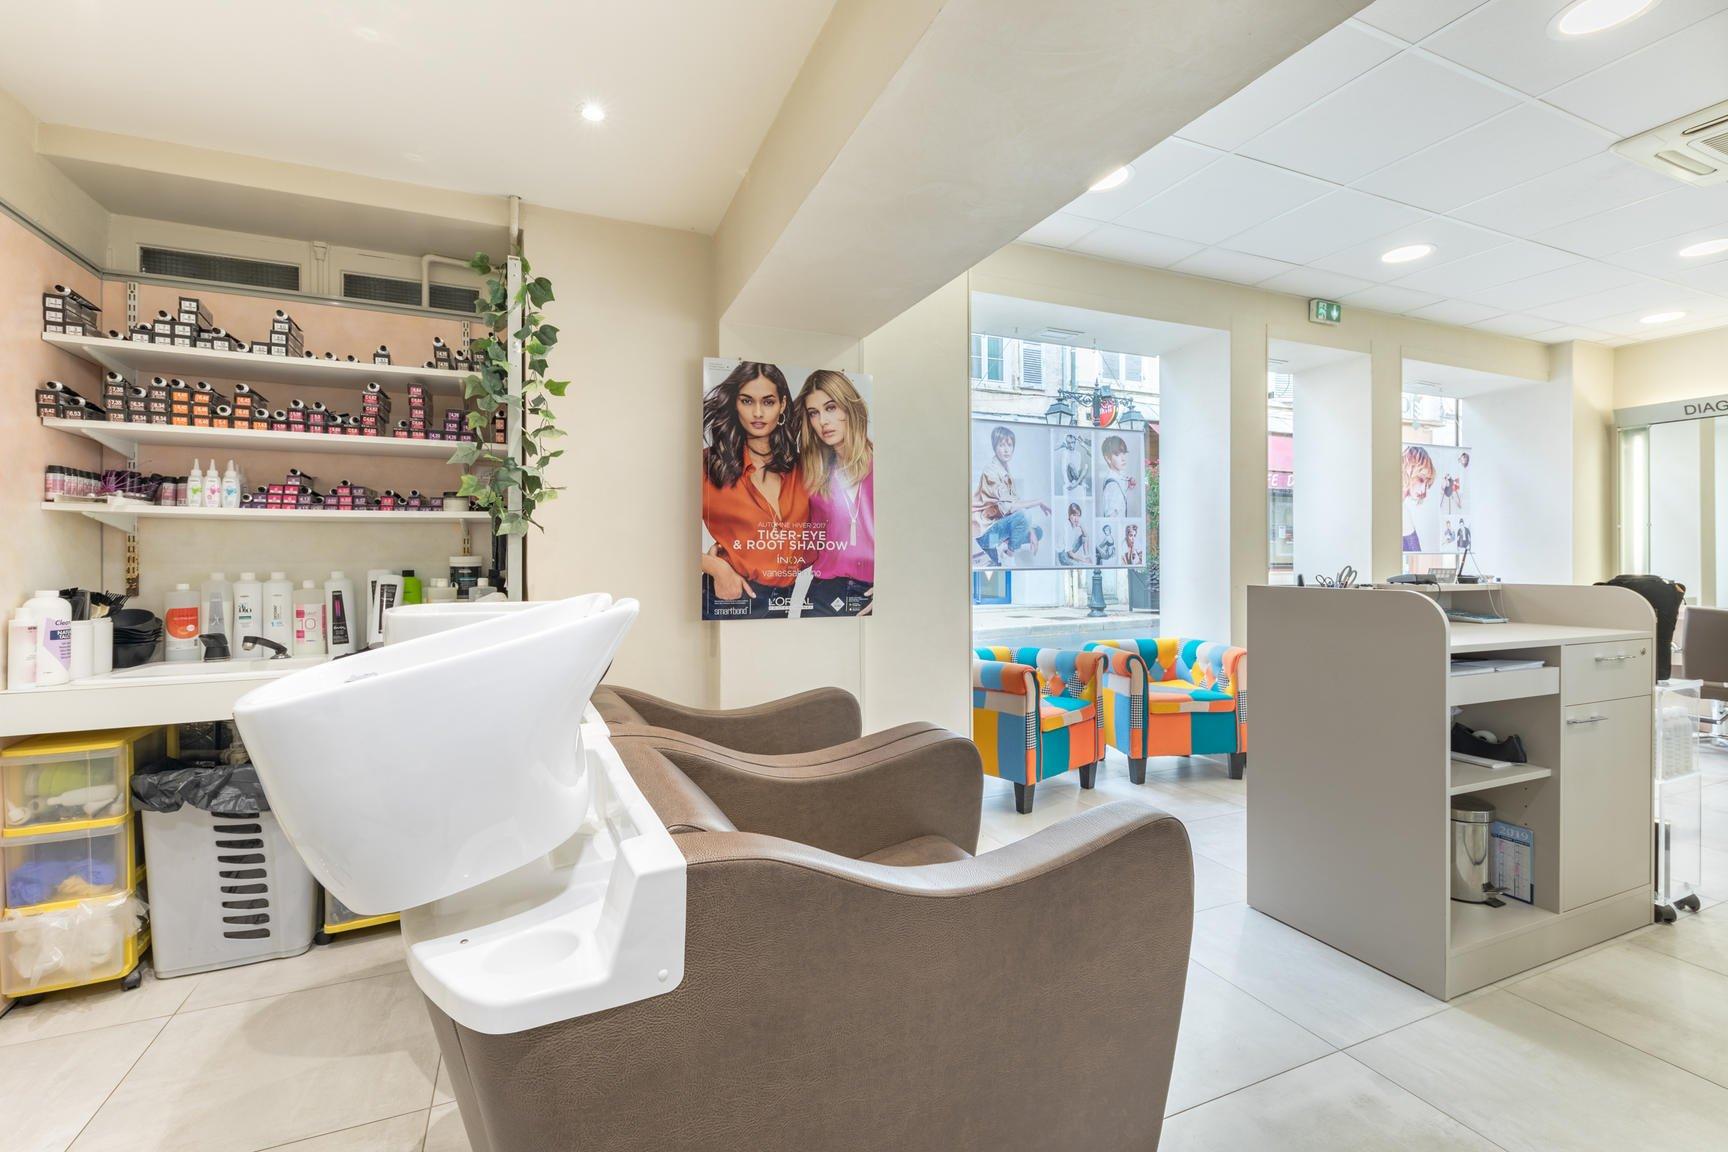 Salon de coiffure mixte - Barbier